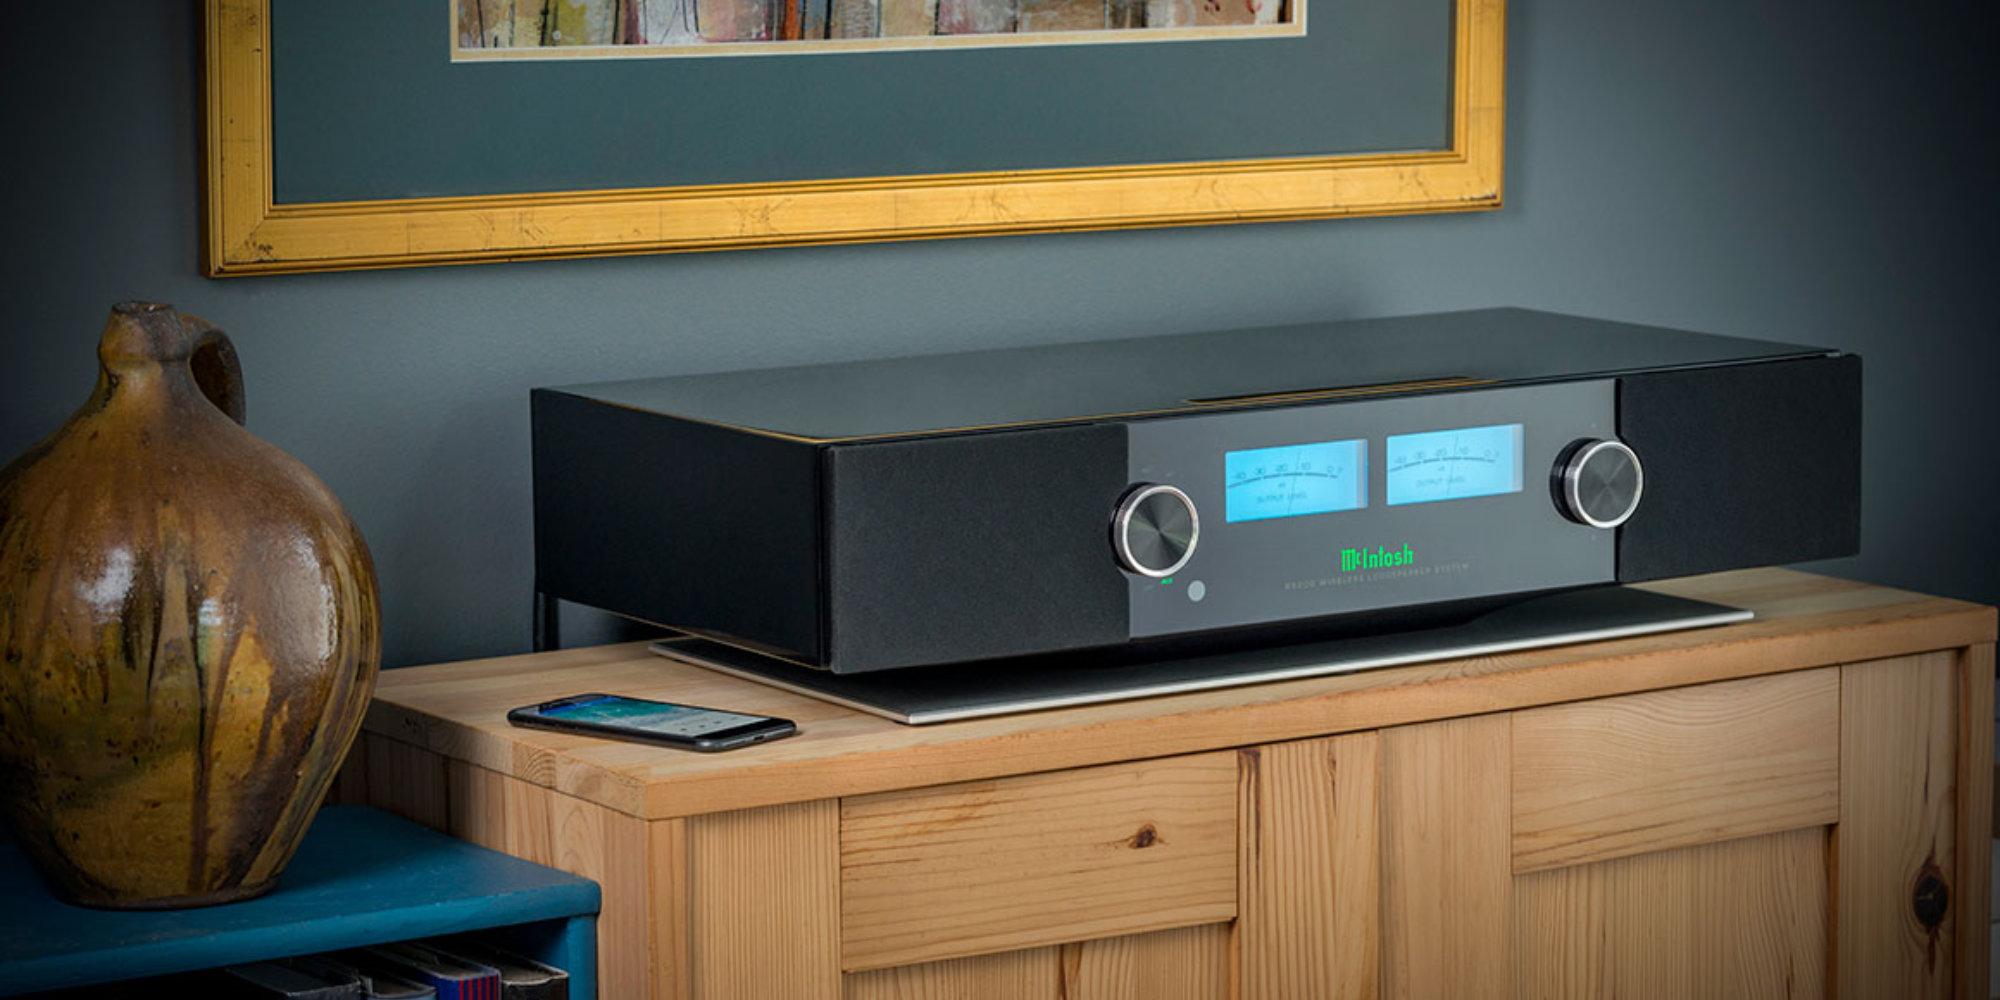 McIntosh's new Wireless Loudspeaker System wields 650W, AirPlay 2, and Alexa compatibility